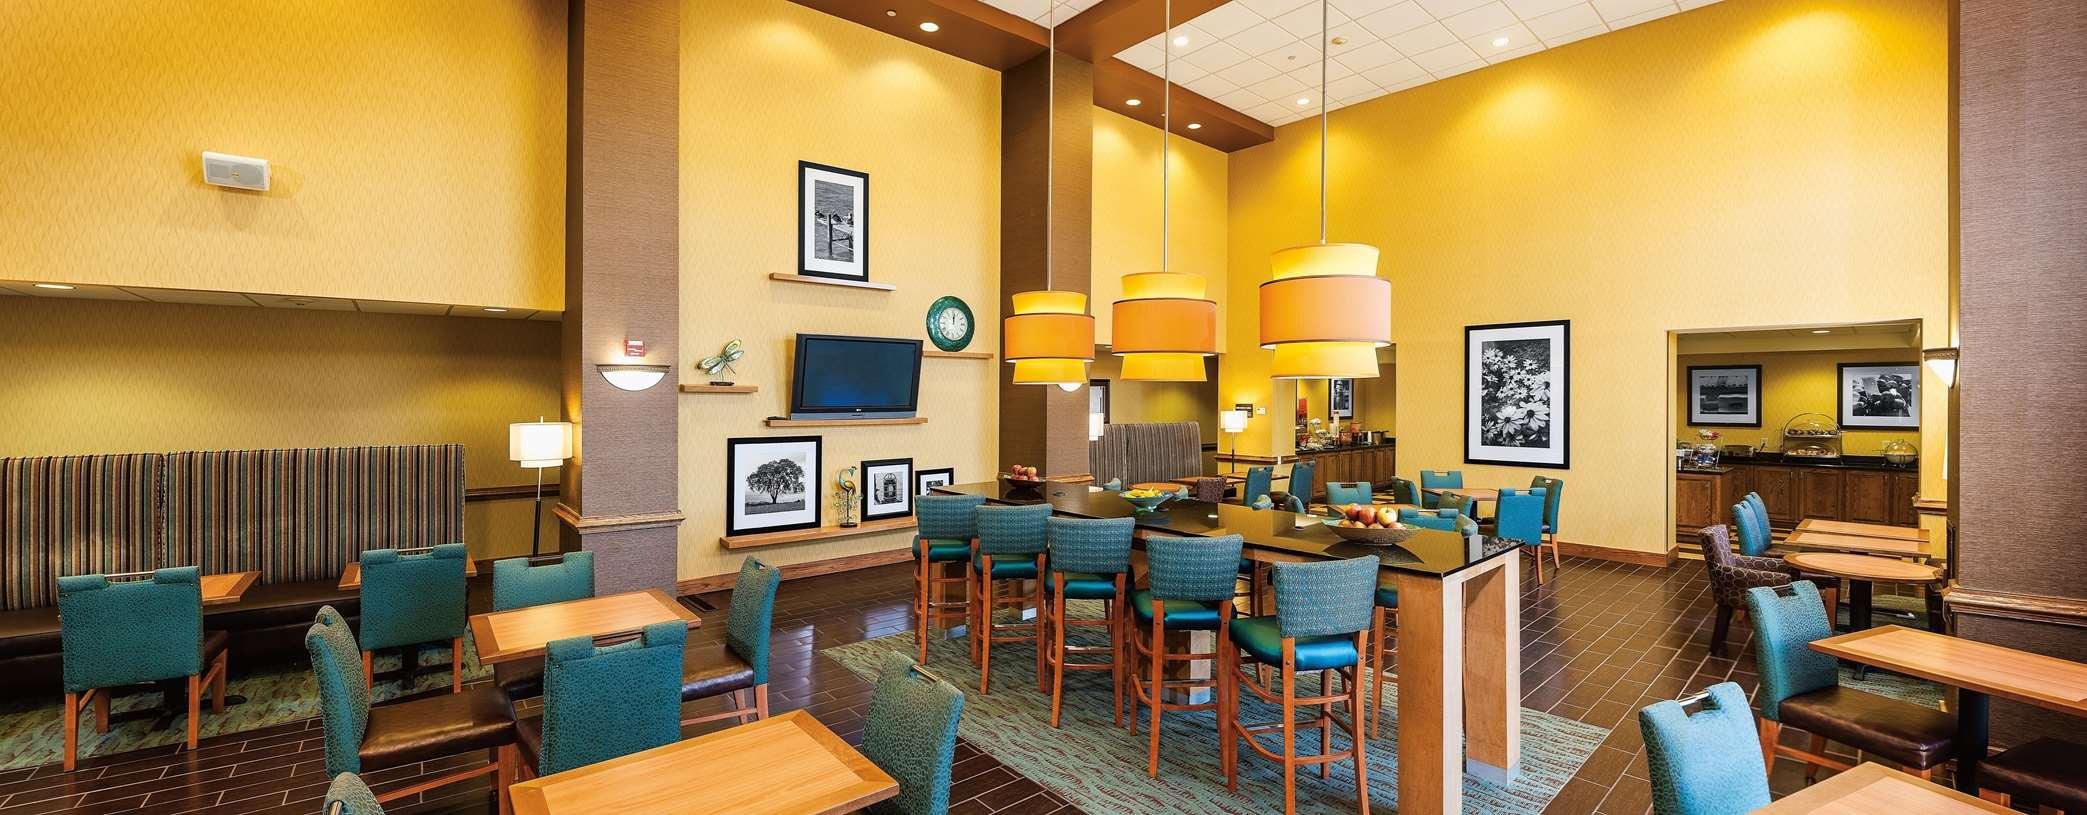 Hotels Near Chesapeake Square Mall